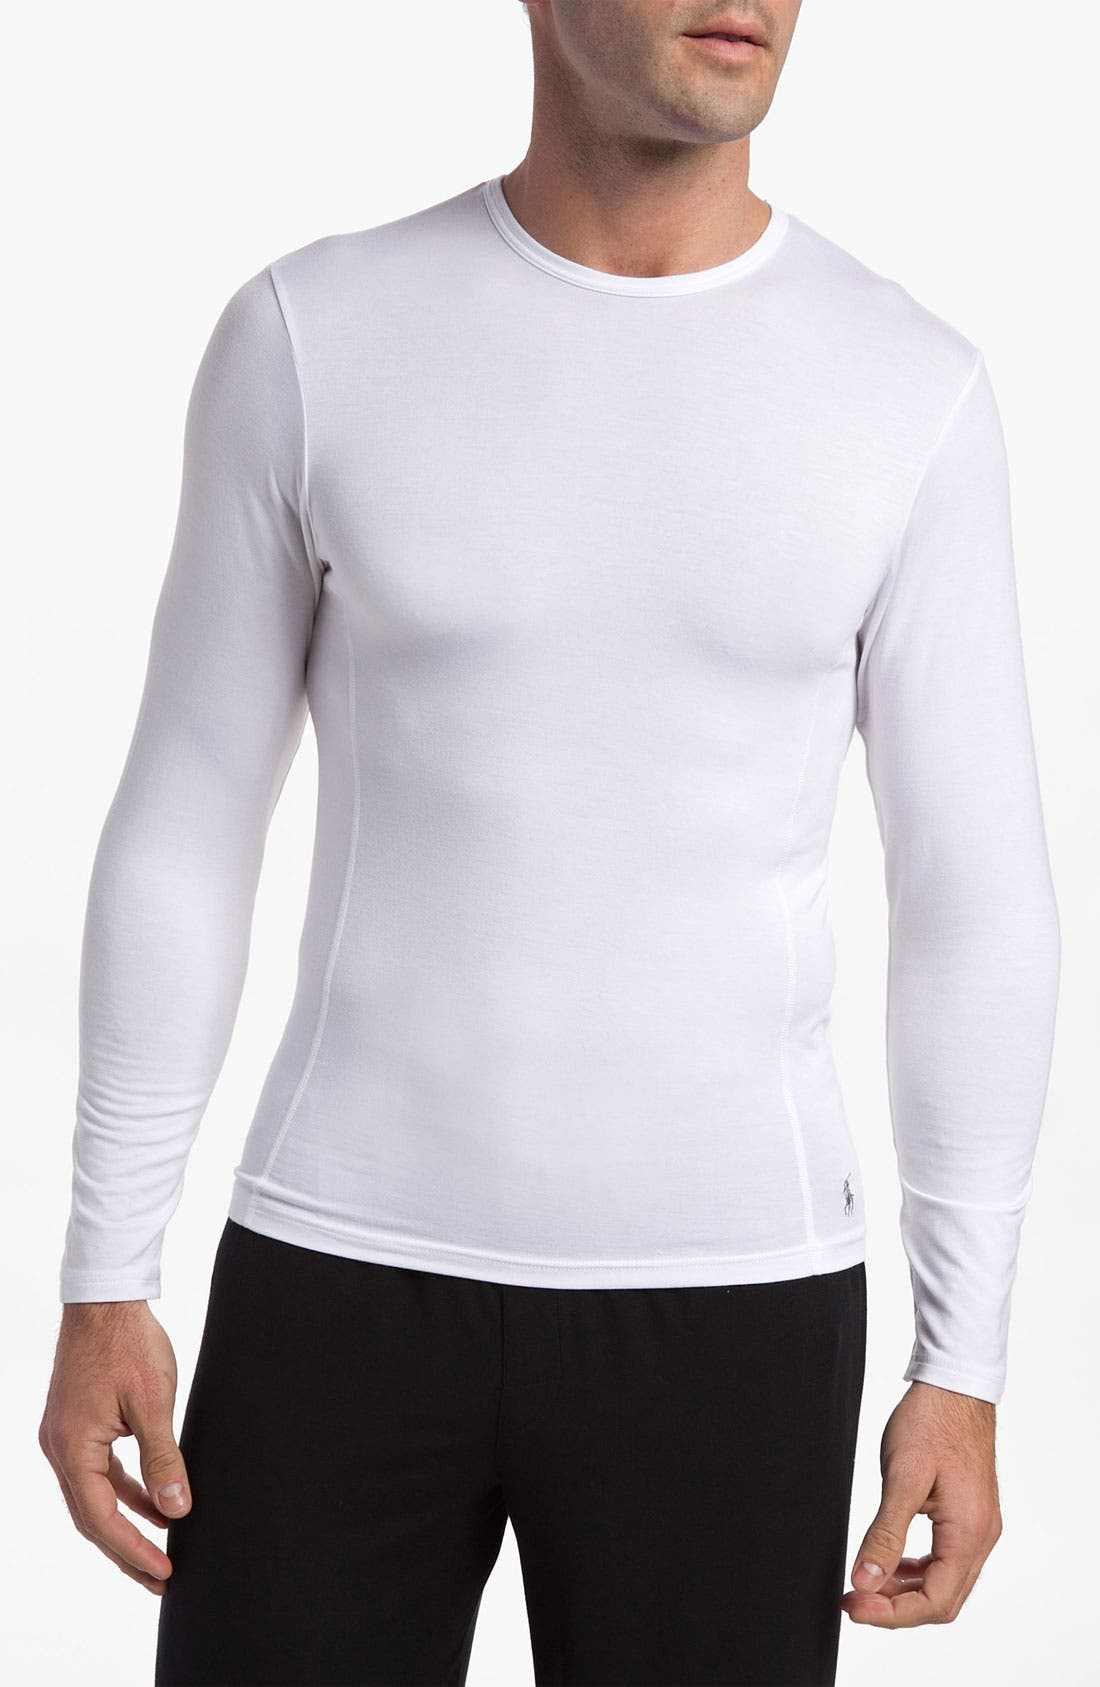 Alternate Image 1 Selected - Polo Ralph Lauren Long Sleeve Crewneck Modal Shirt